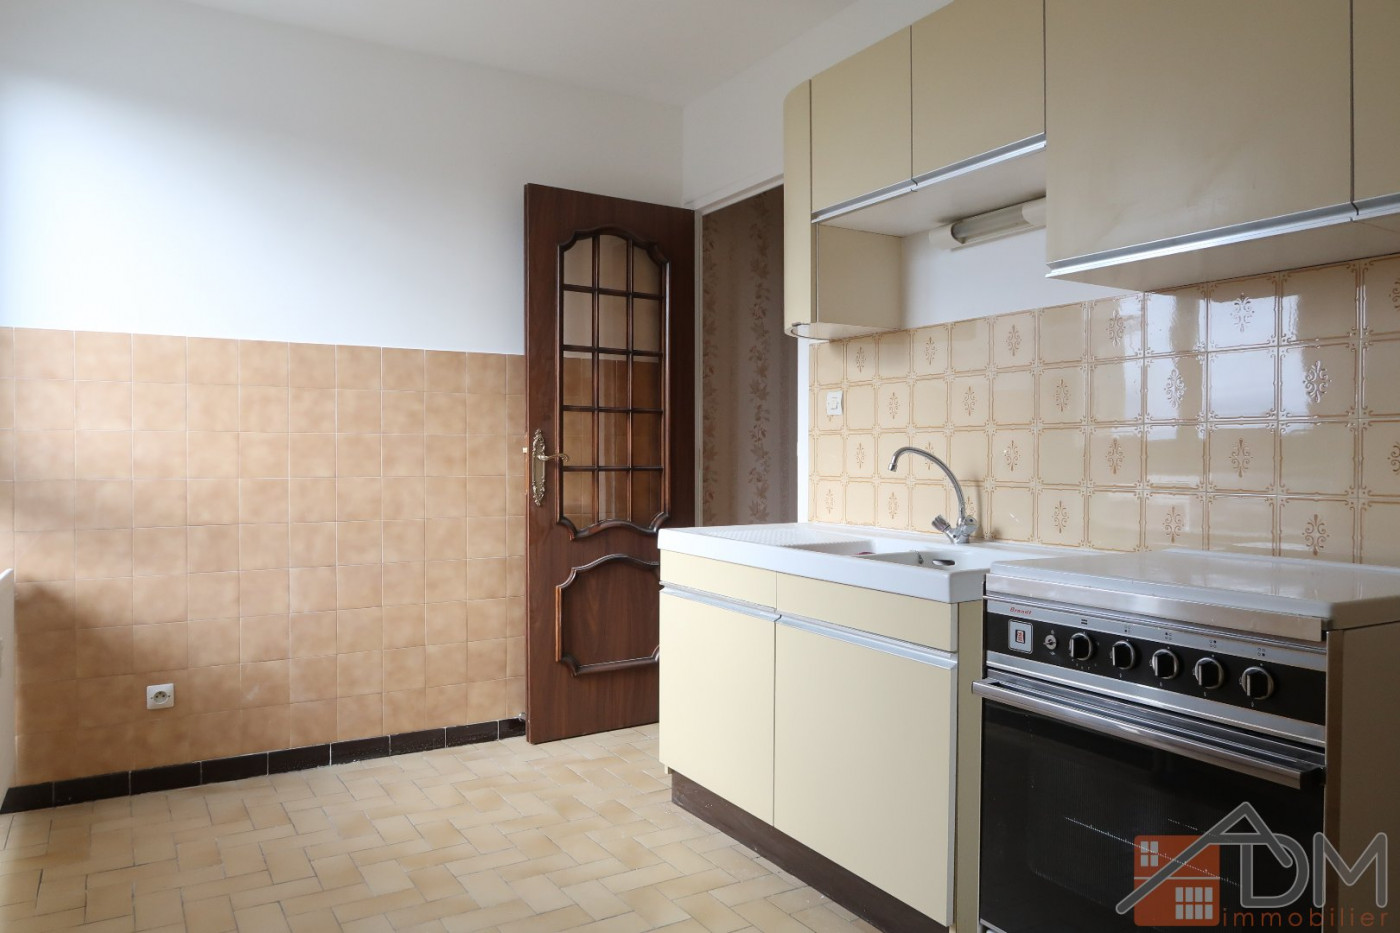 A vendre La Ricamarie 420013268 Adm immobilier